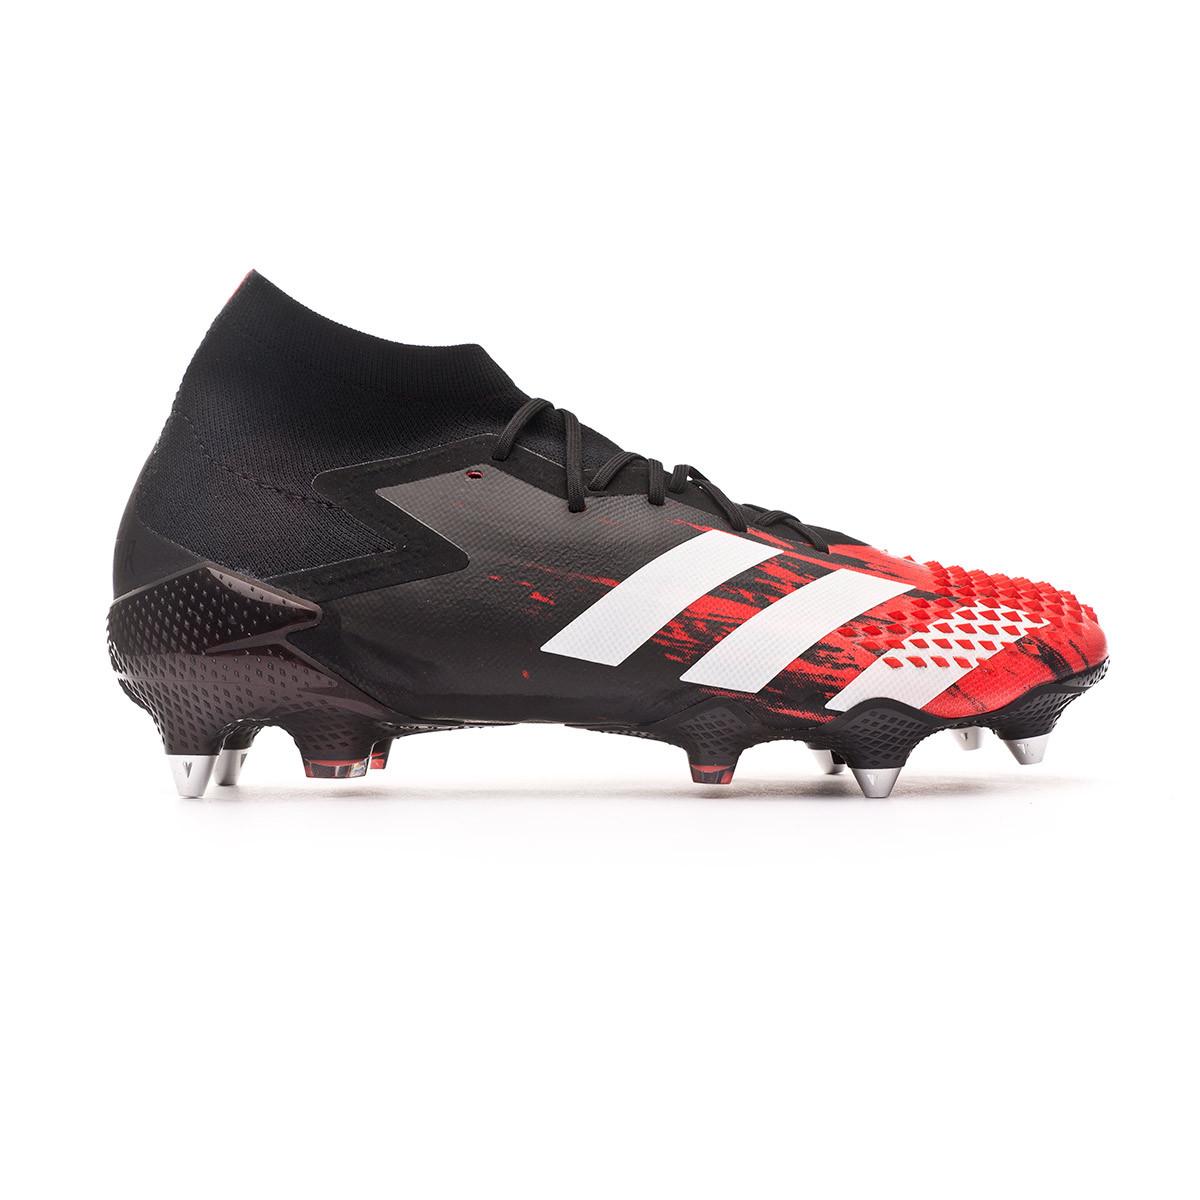 Chaussure de foot adidas Predator 20.1 SG